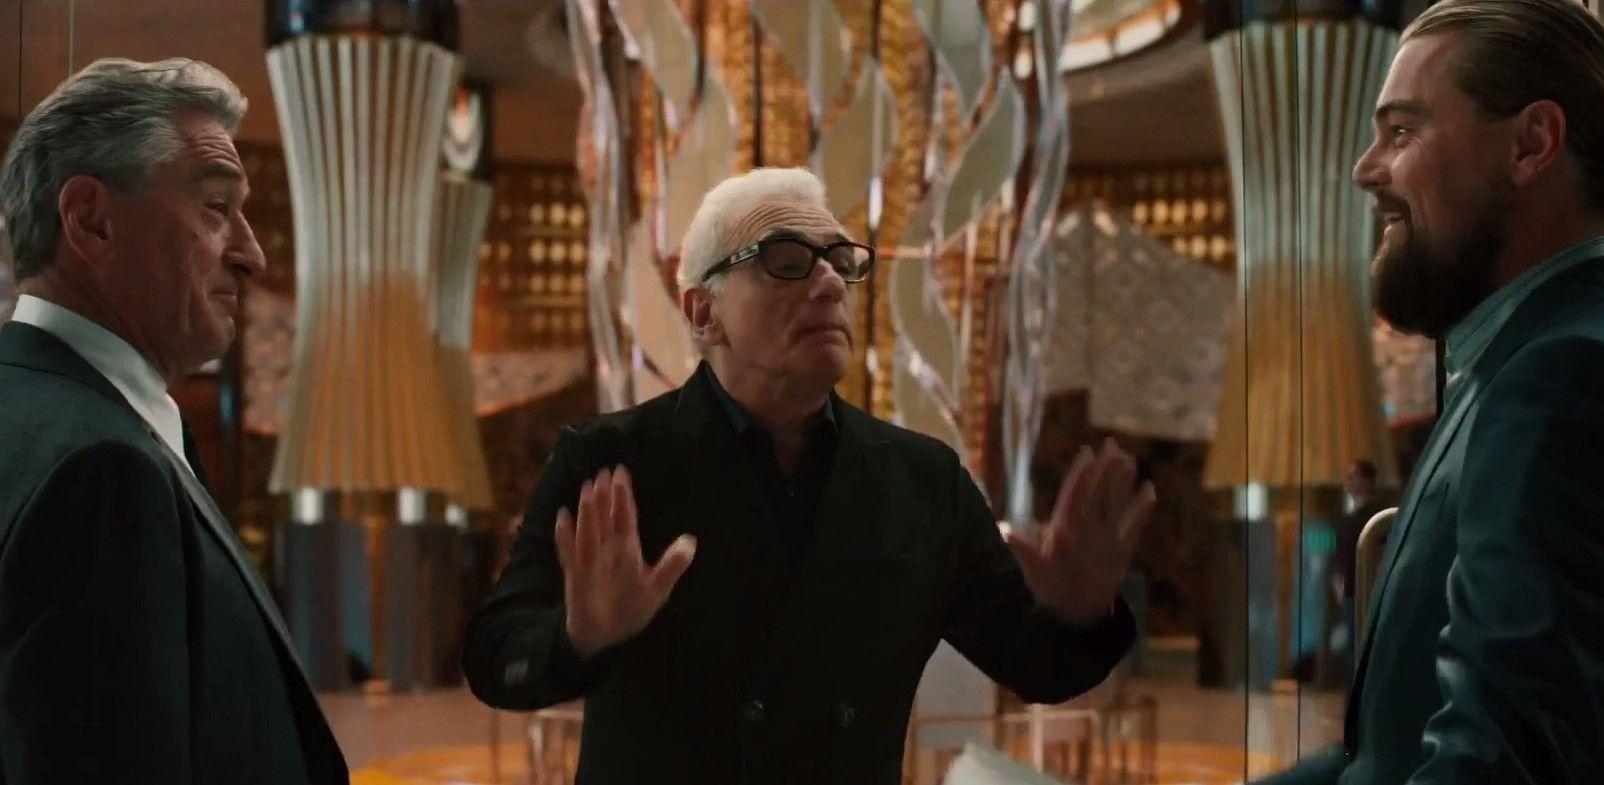 Scorsese, De Niro and DiCaprio